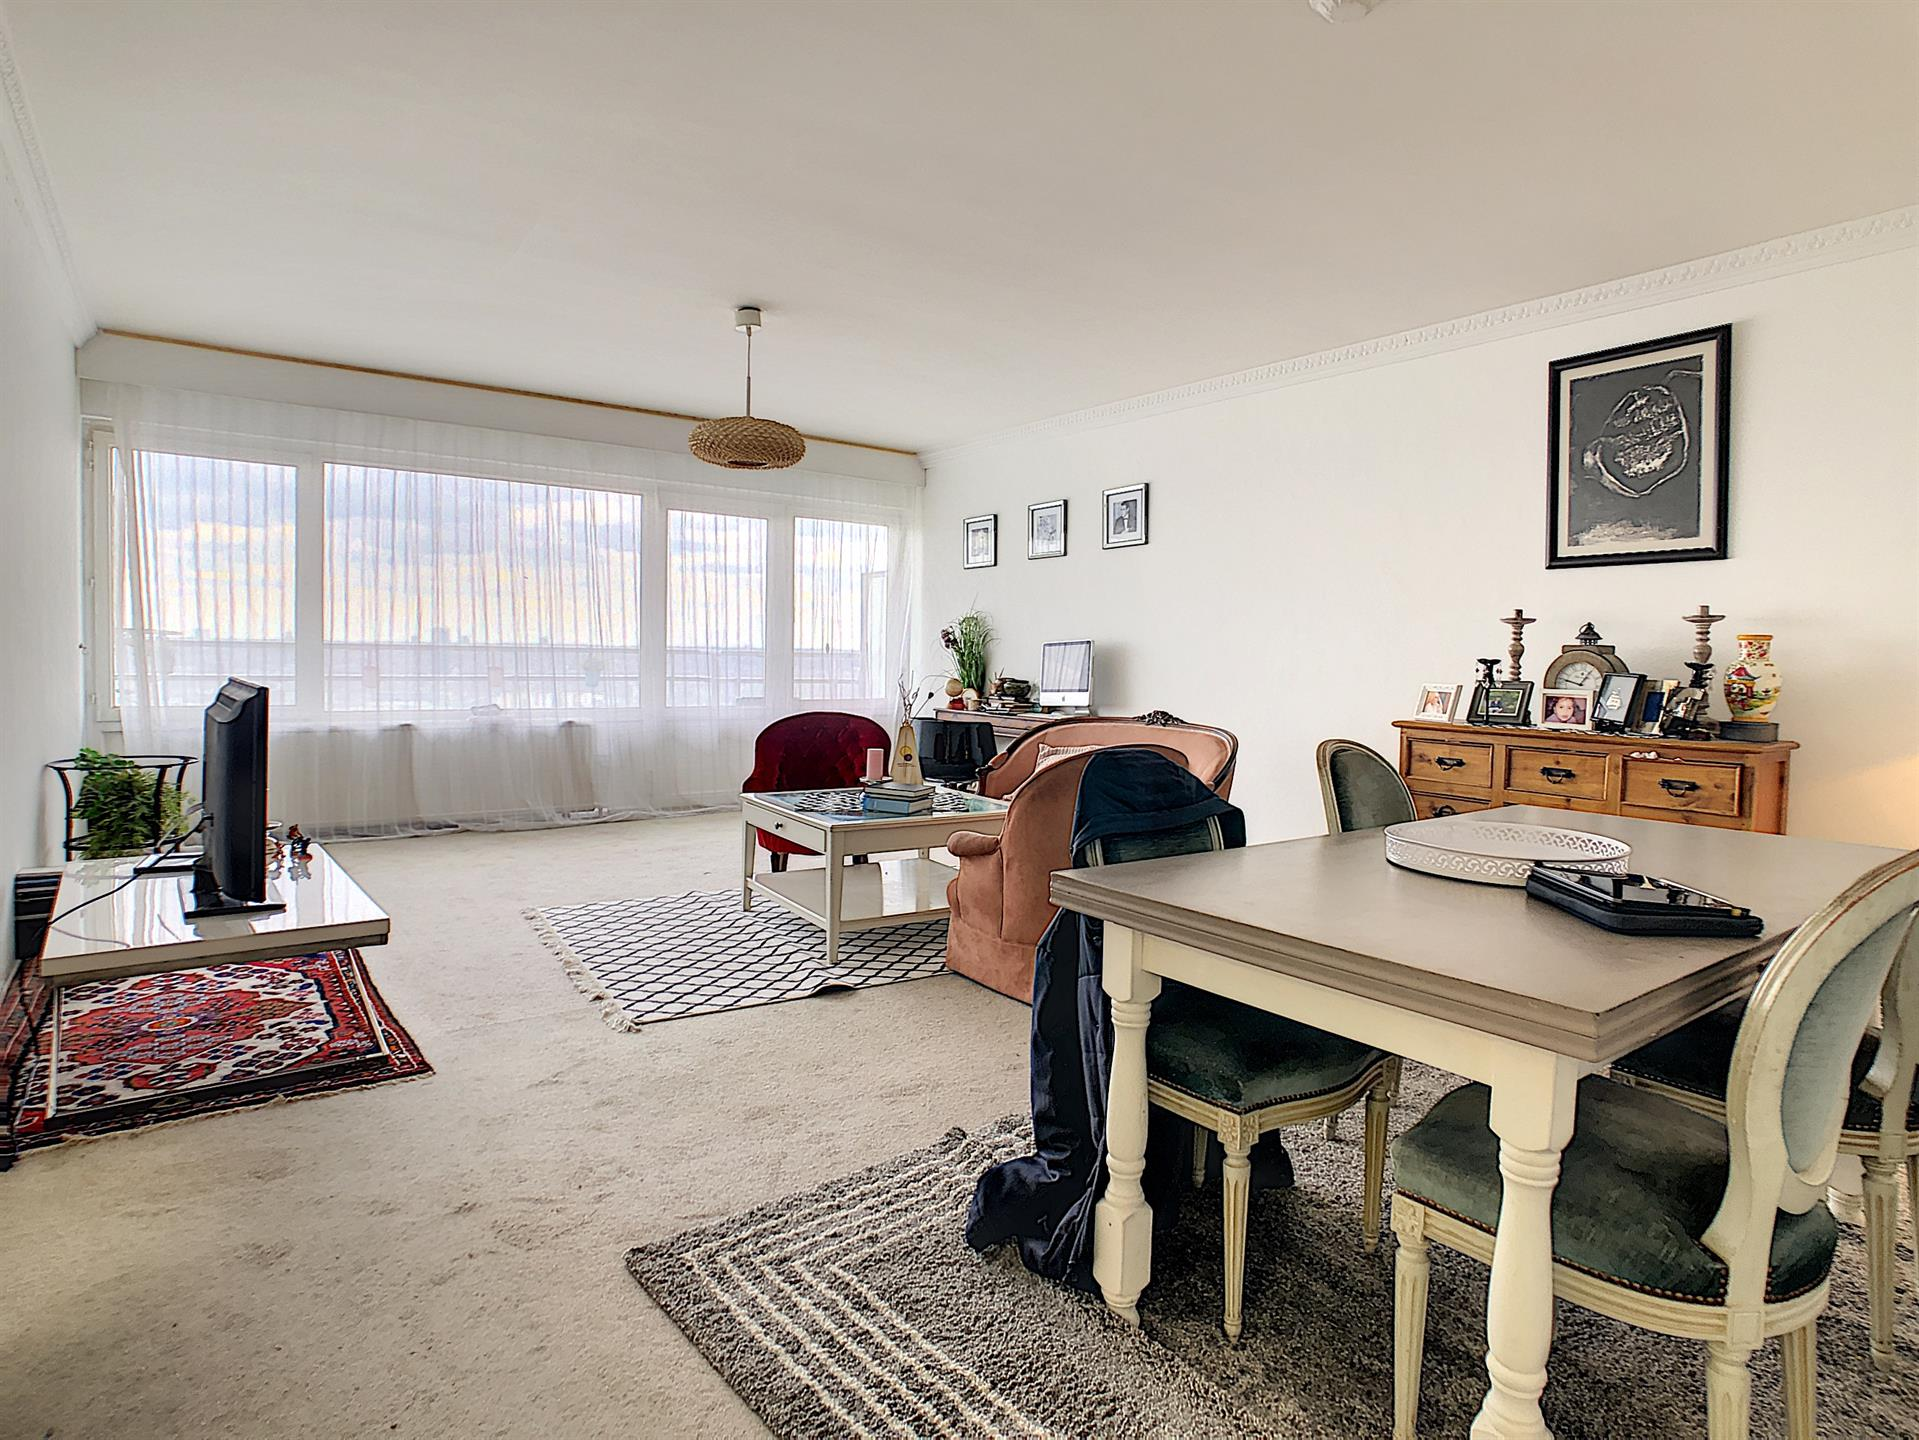 Appartement - Molenbeek-Saint-Jean - #4320527-2